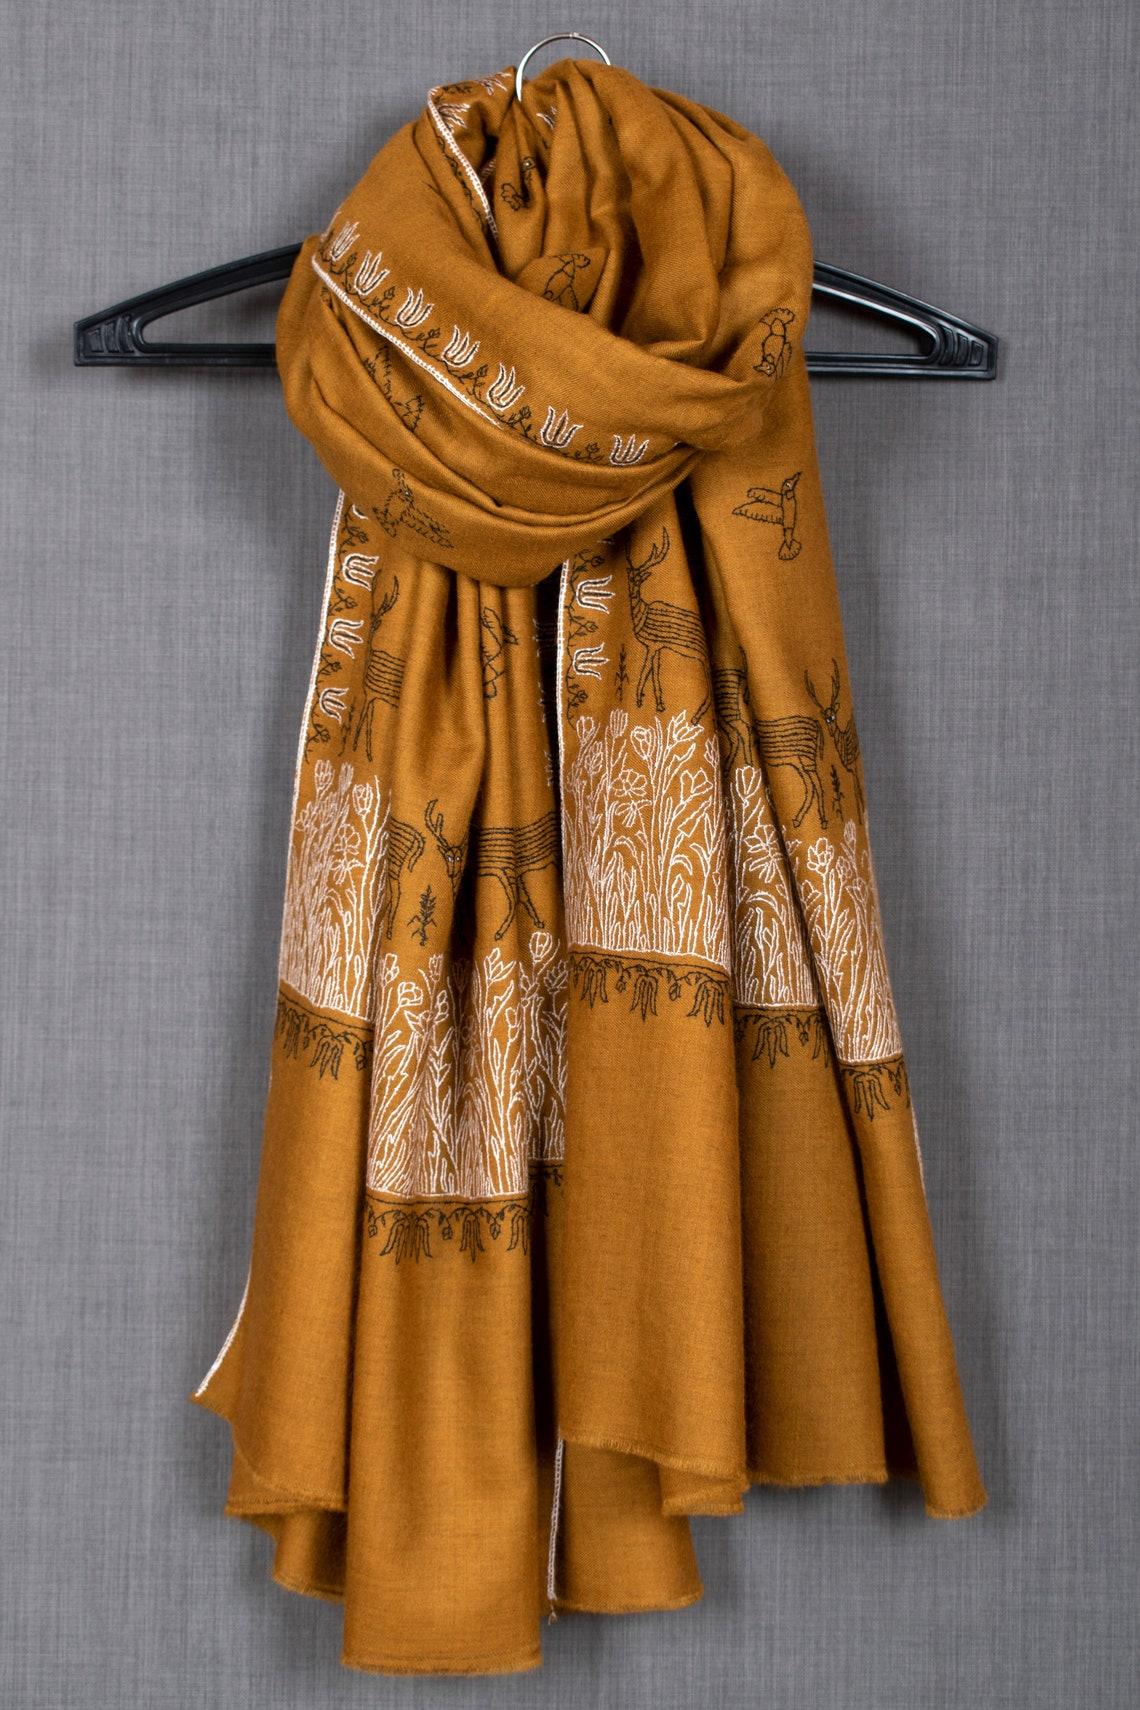 Batool Collection Pashmina Shawl No. 2 Sozni Needlework Wrap image 1